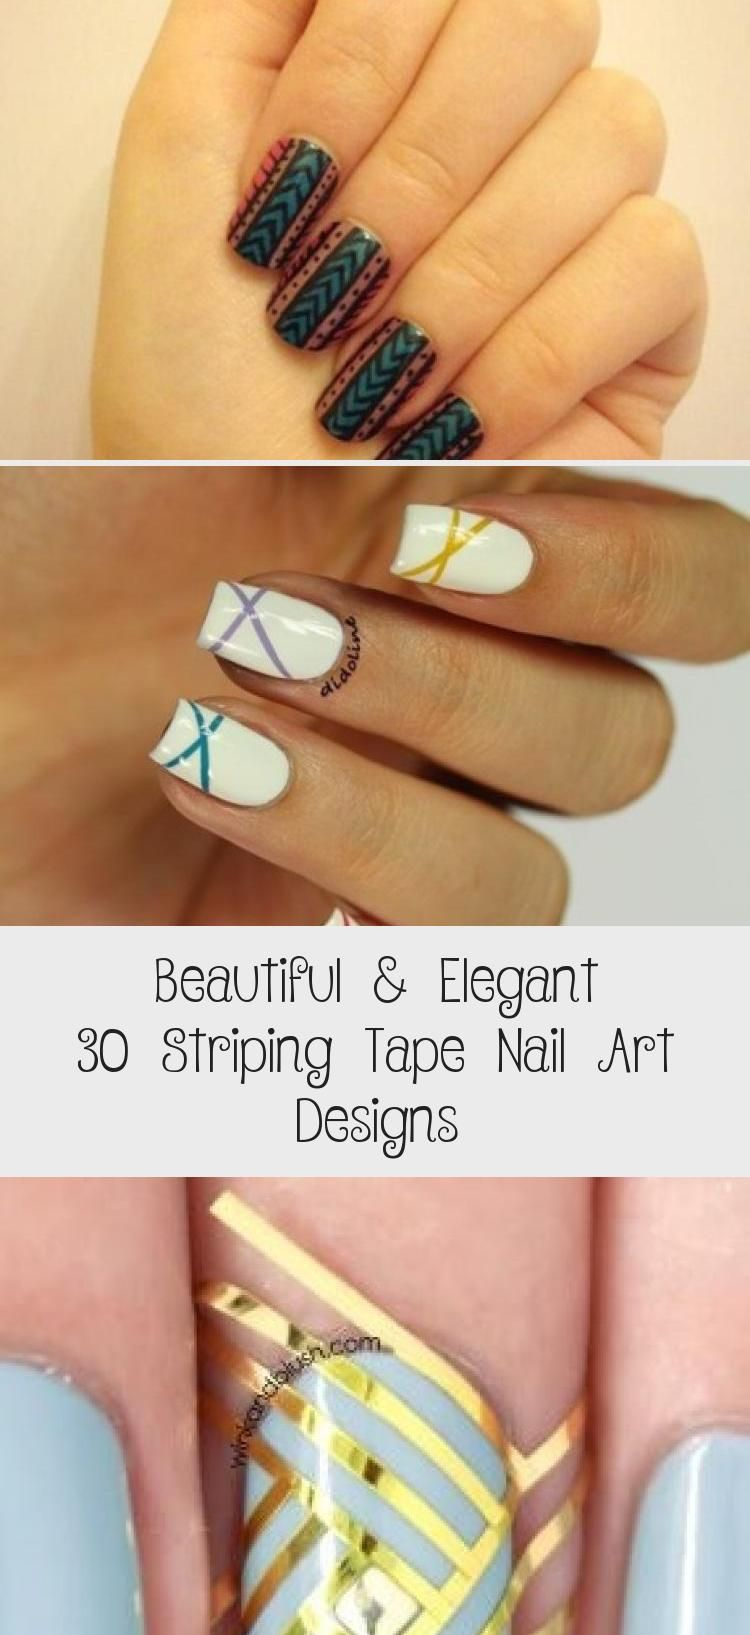 Photo of Beautiful & Elegant 30 Striping Tape Nail Art Designs – Nail Art